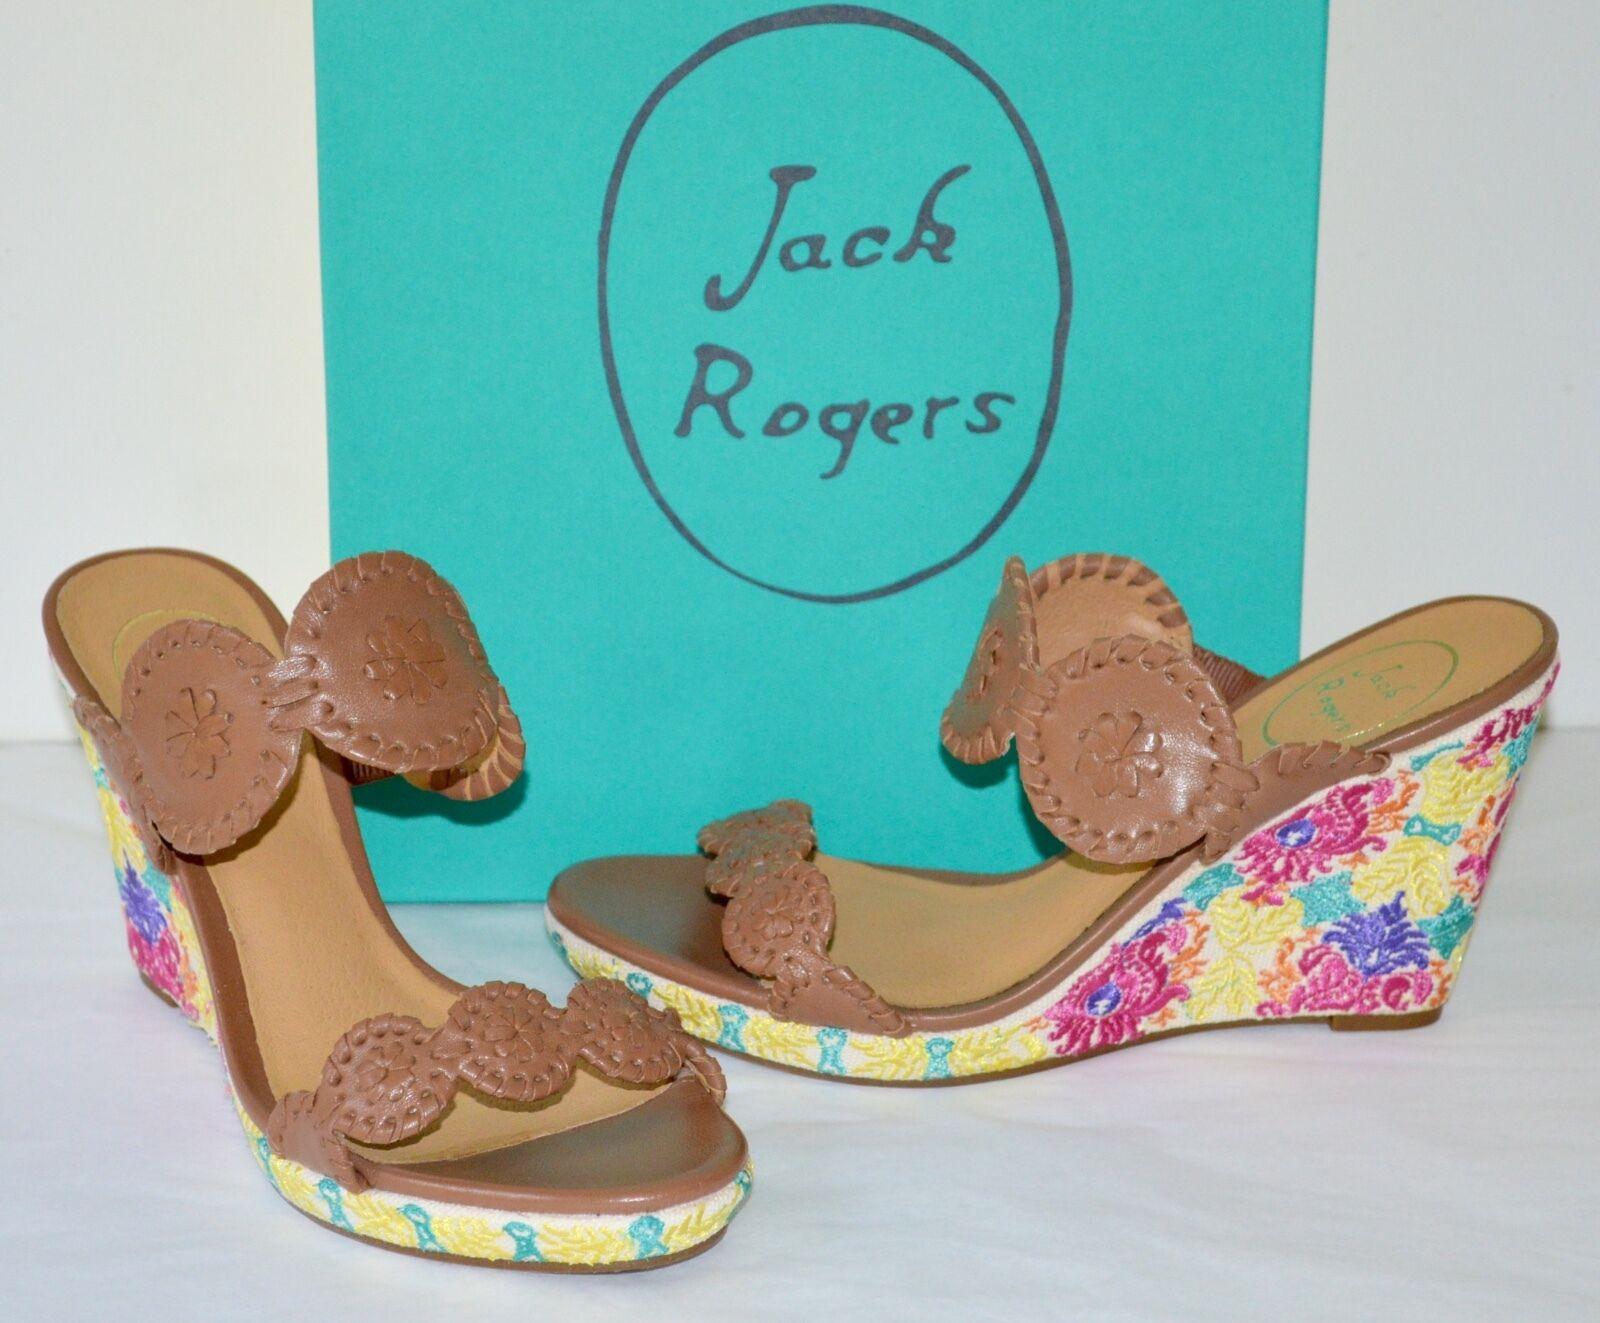 New  198 Jack Rogers Livvy Cognac Leather Wedge Crochet Flowers Sandal Slides